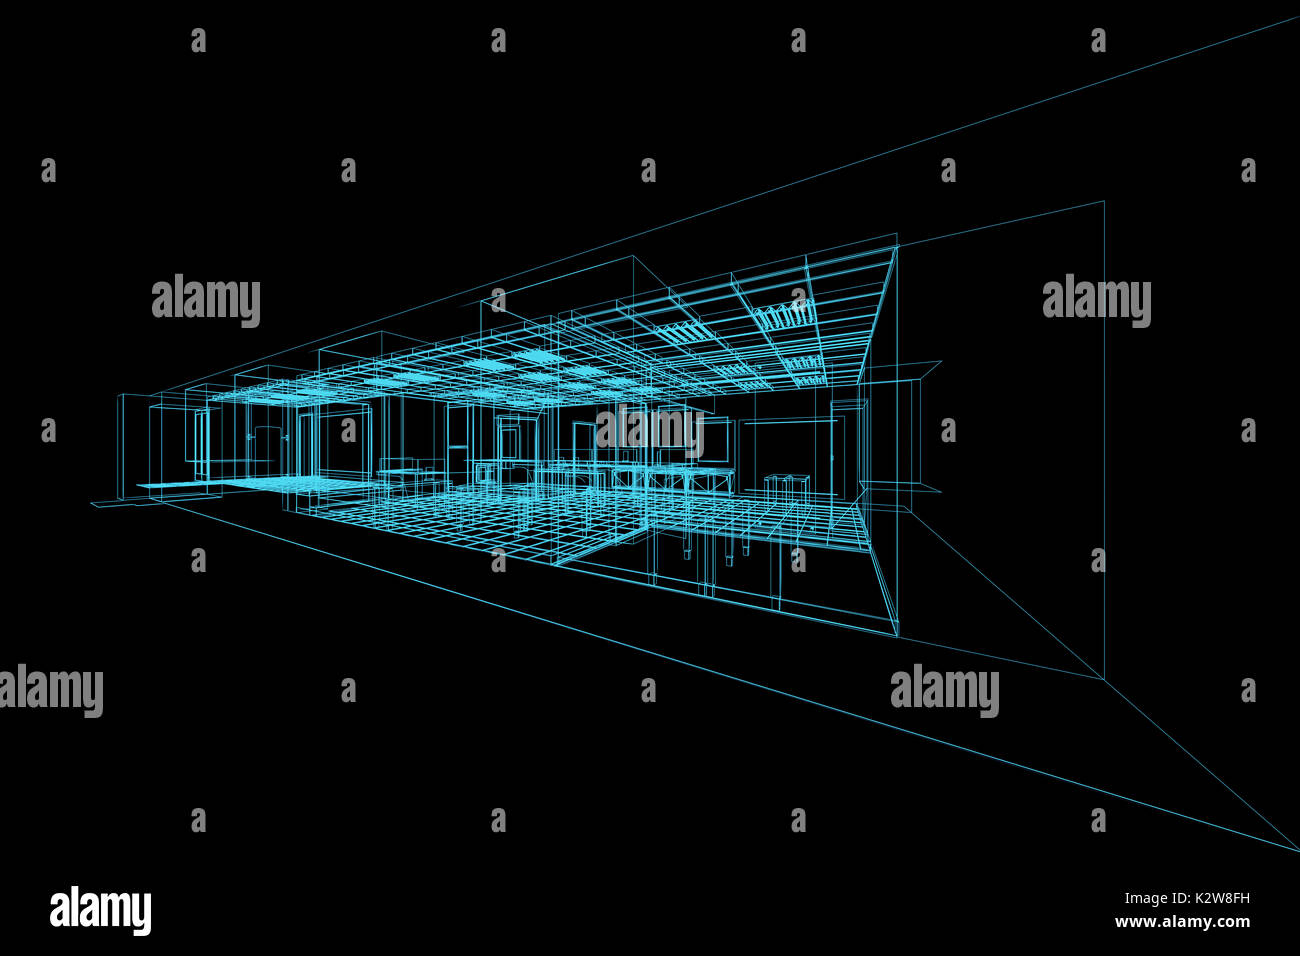 Interior blueprint on black 3d rendering stock photo 156678133 alamy interior blueprint on black 3d rendering malvernweather Choice Image